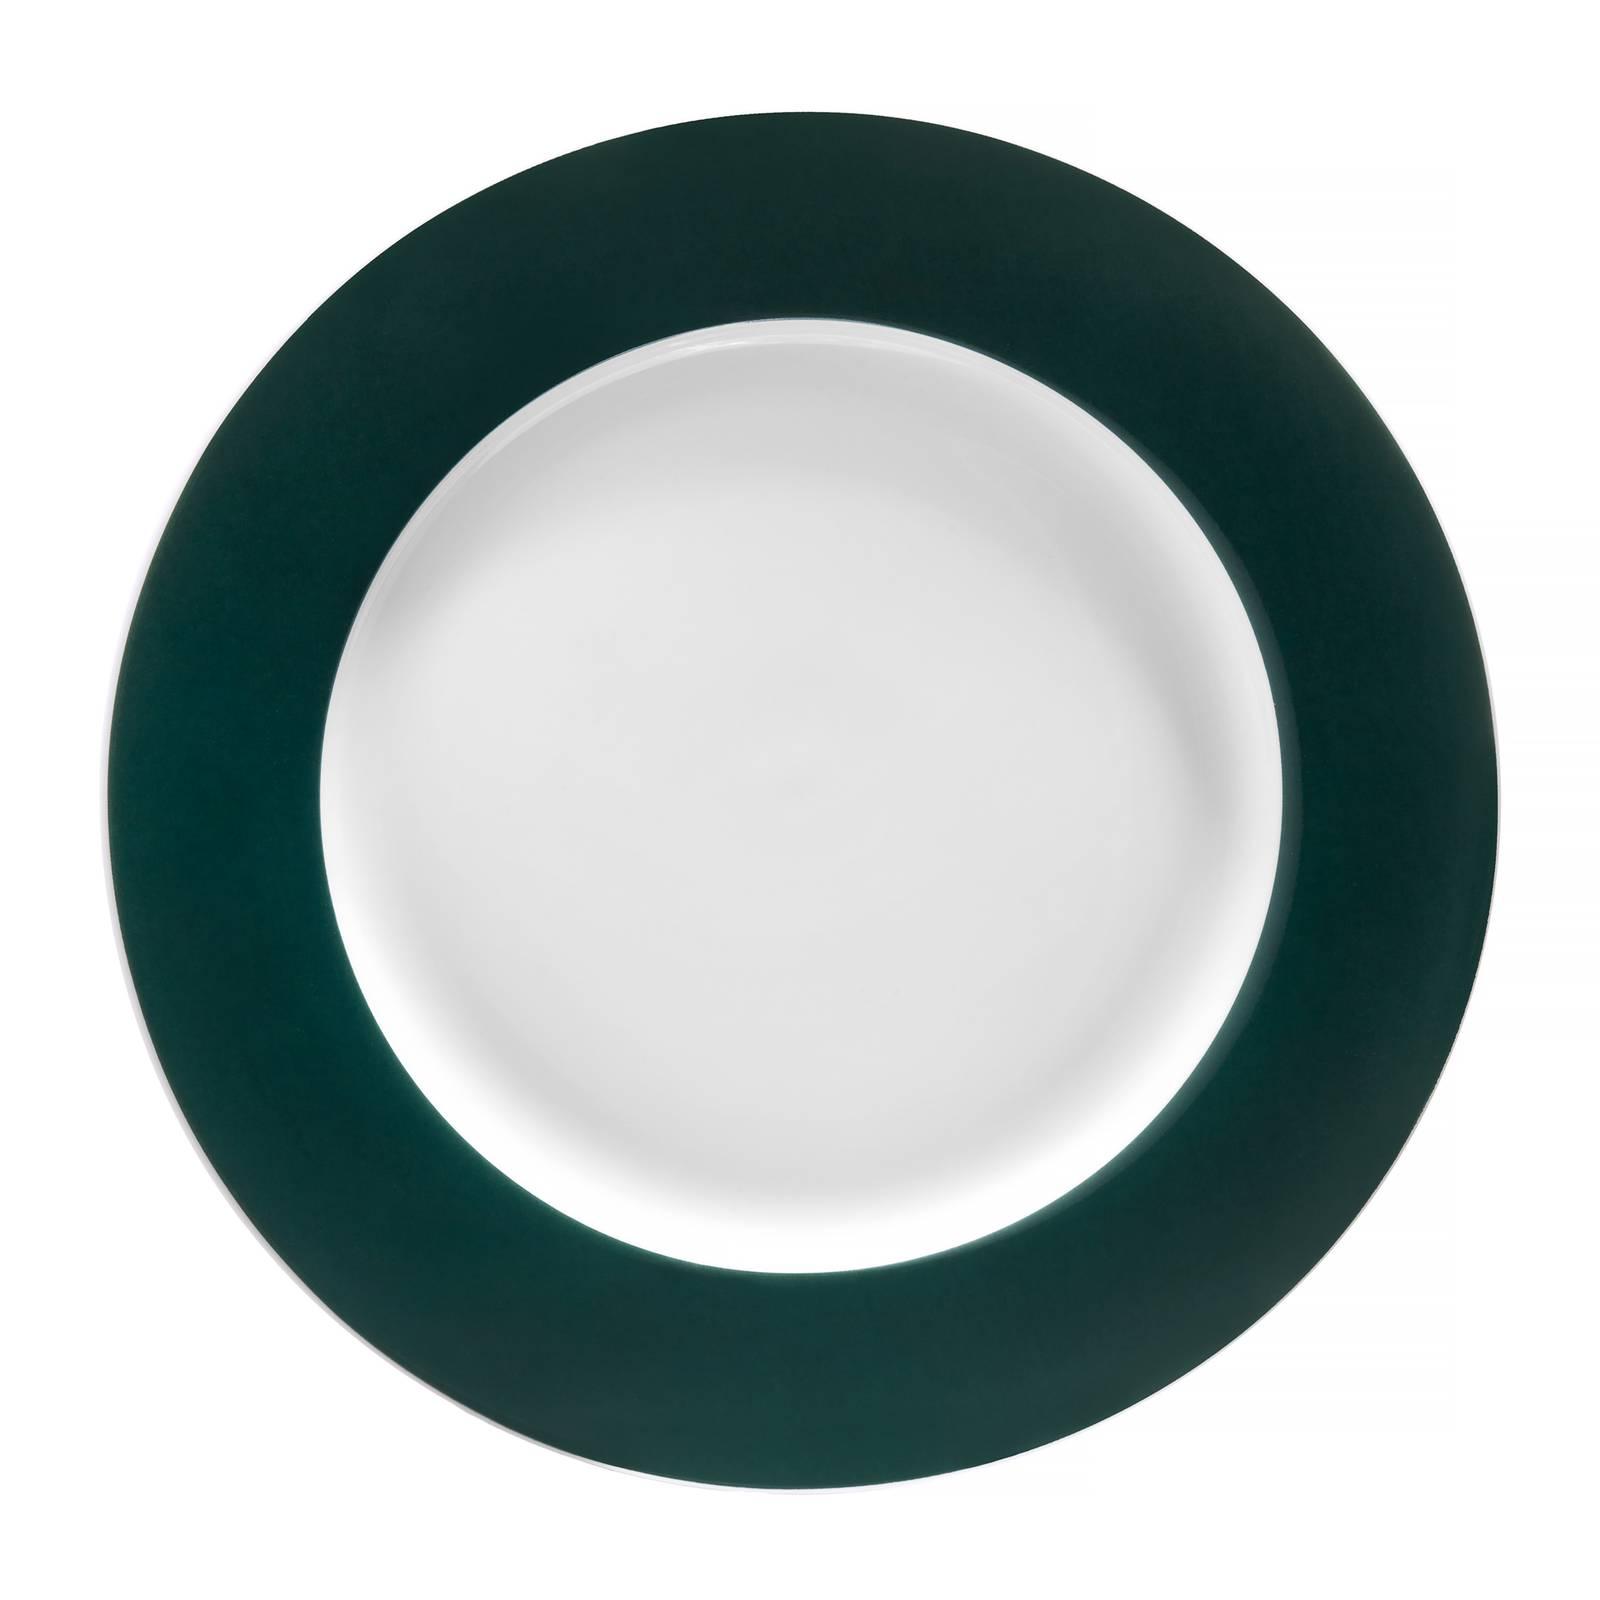 Talerz deserowy Aura Green 19 cm AMBITION